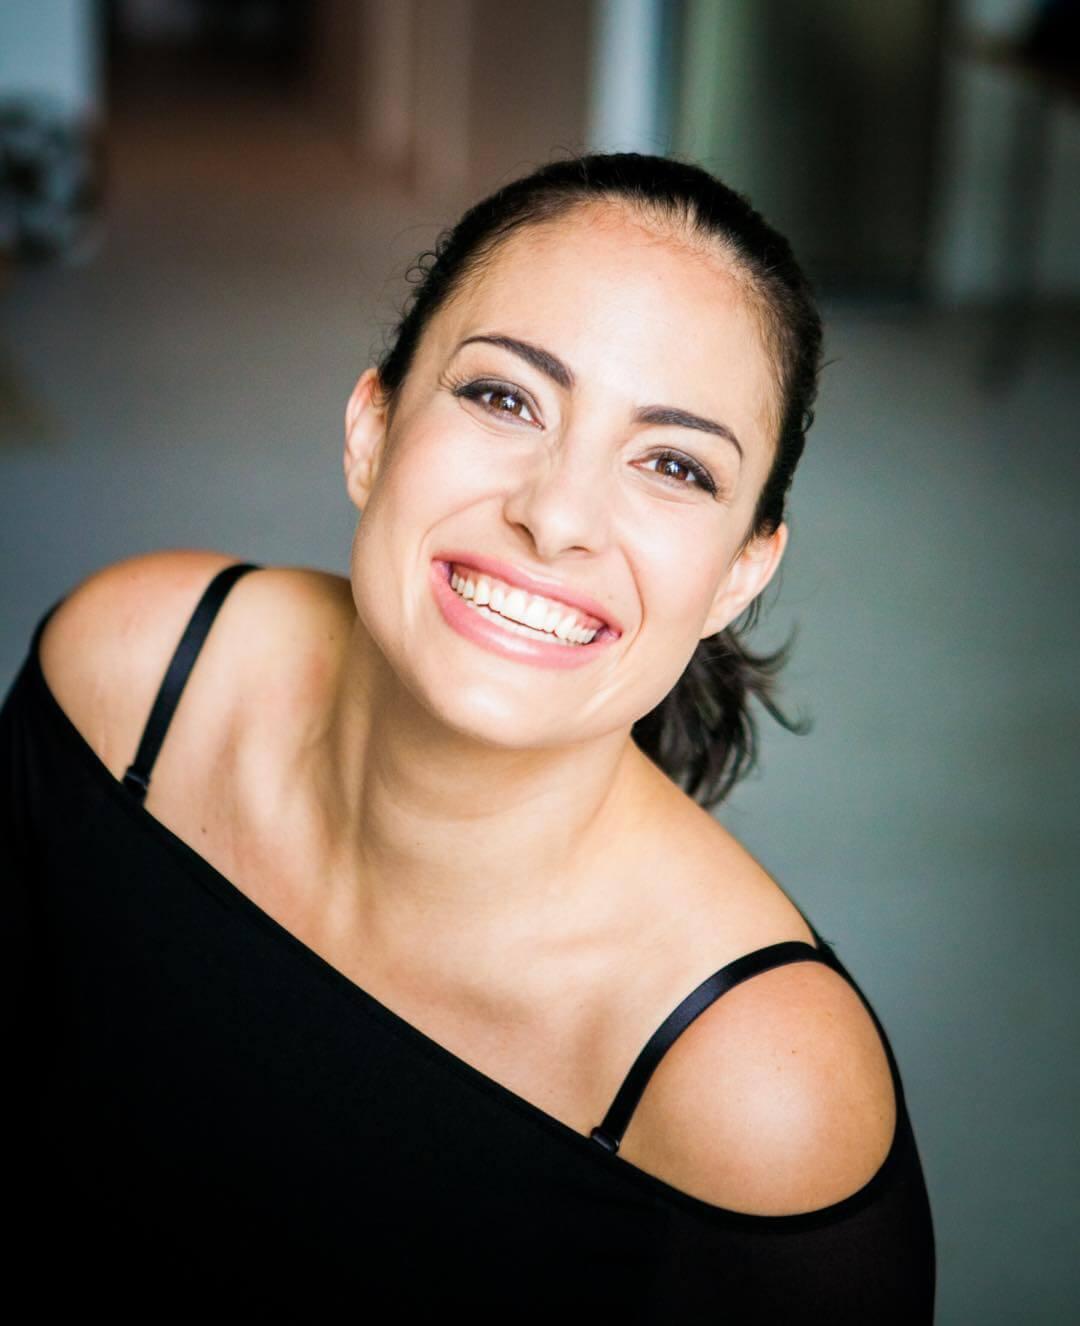 Nicola Correia-Damude